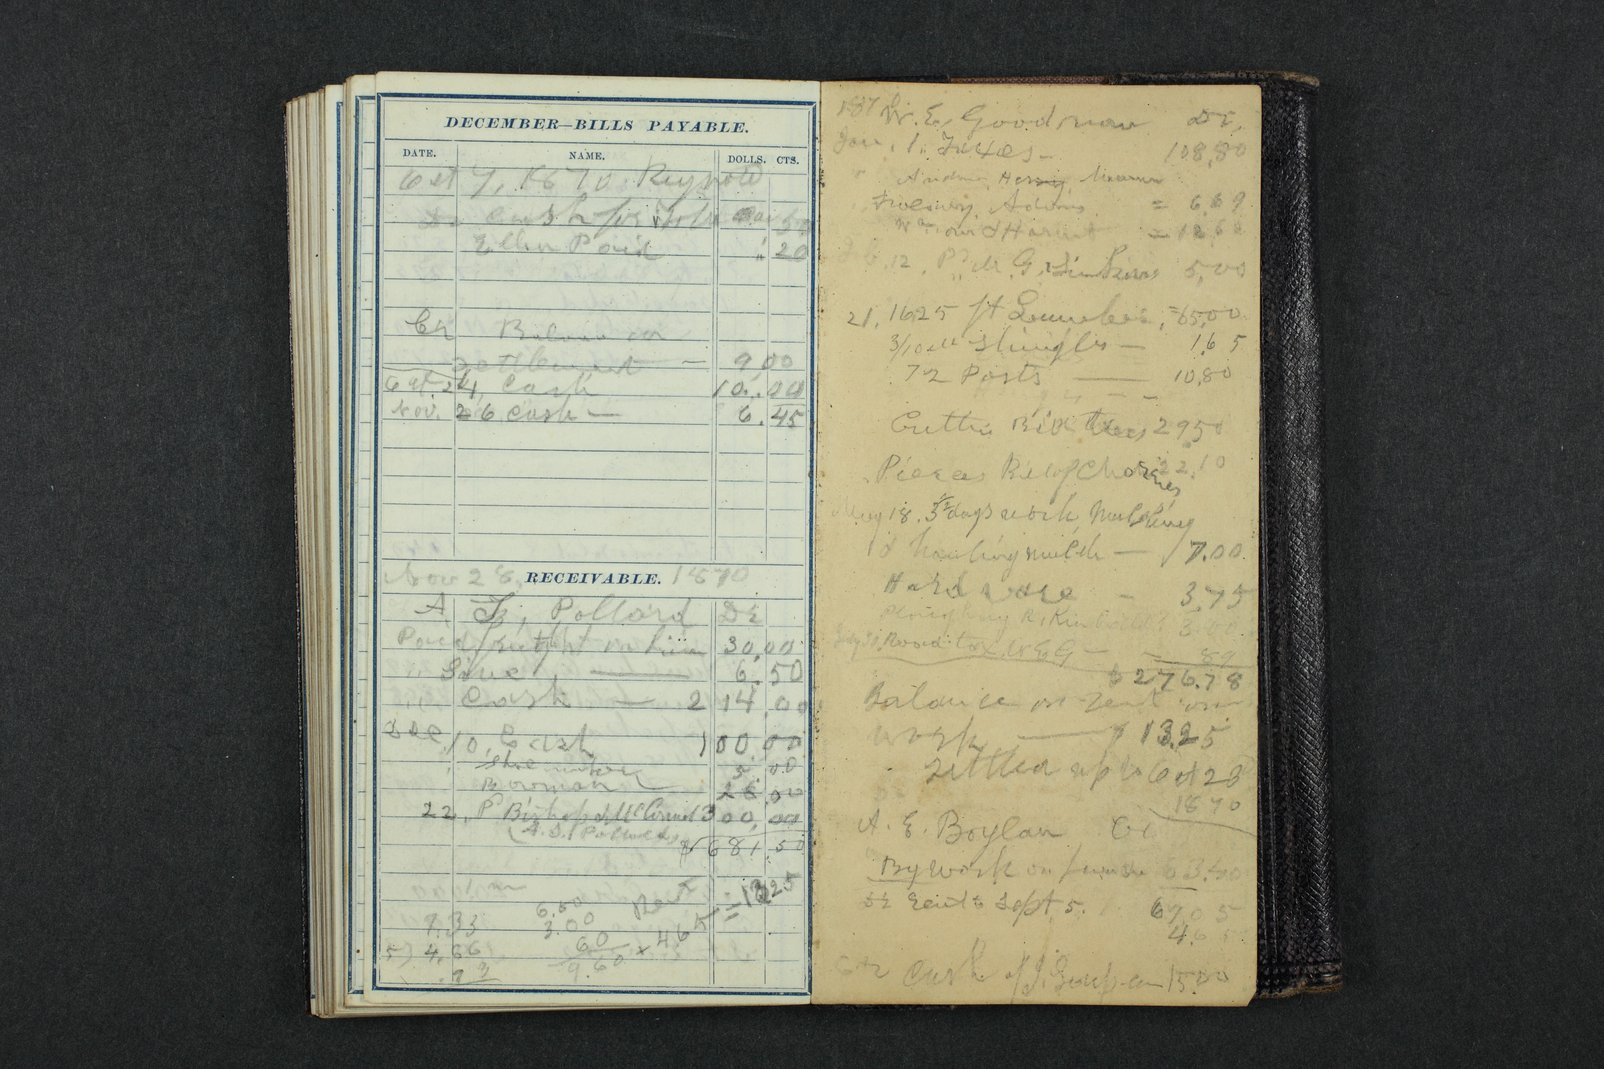 Isaac Tichenor Goodnow diary - 100